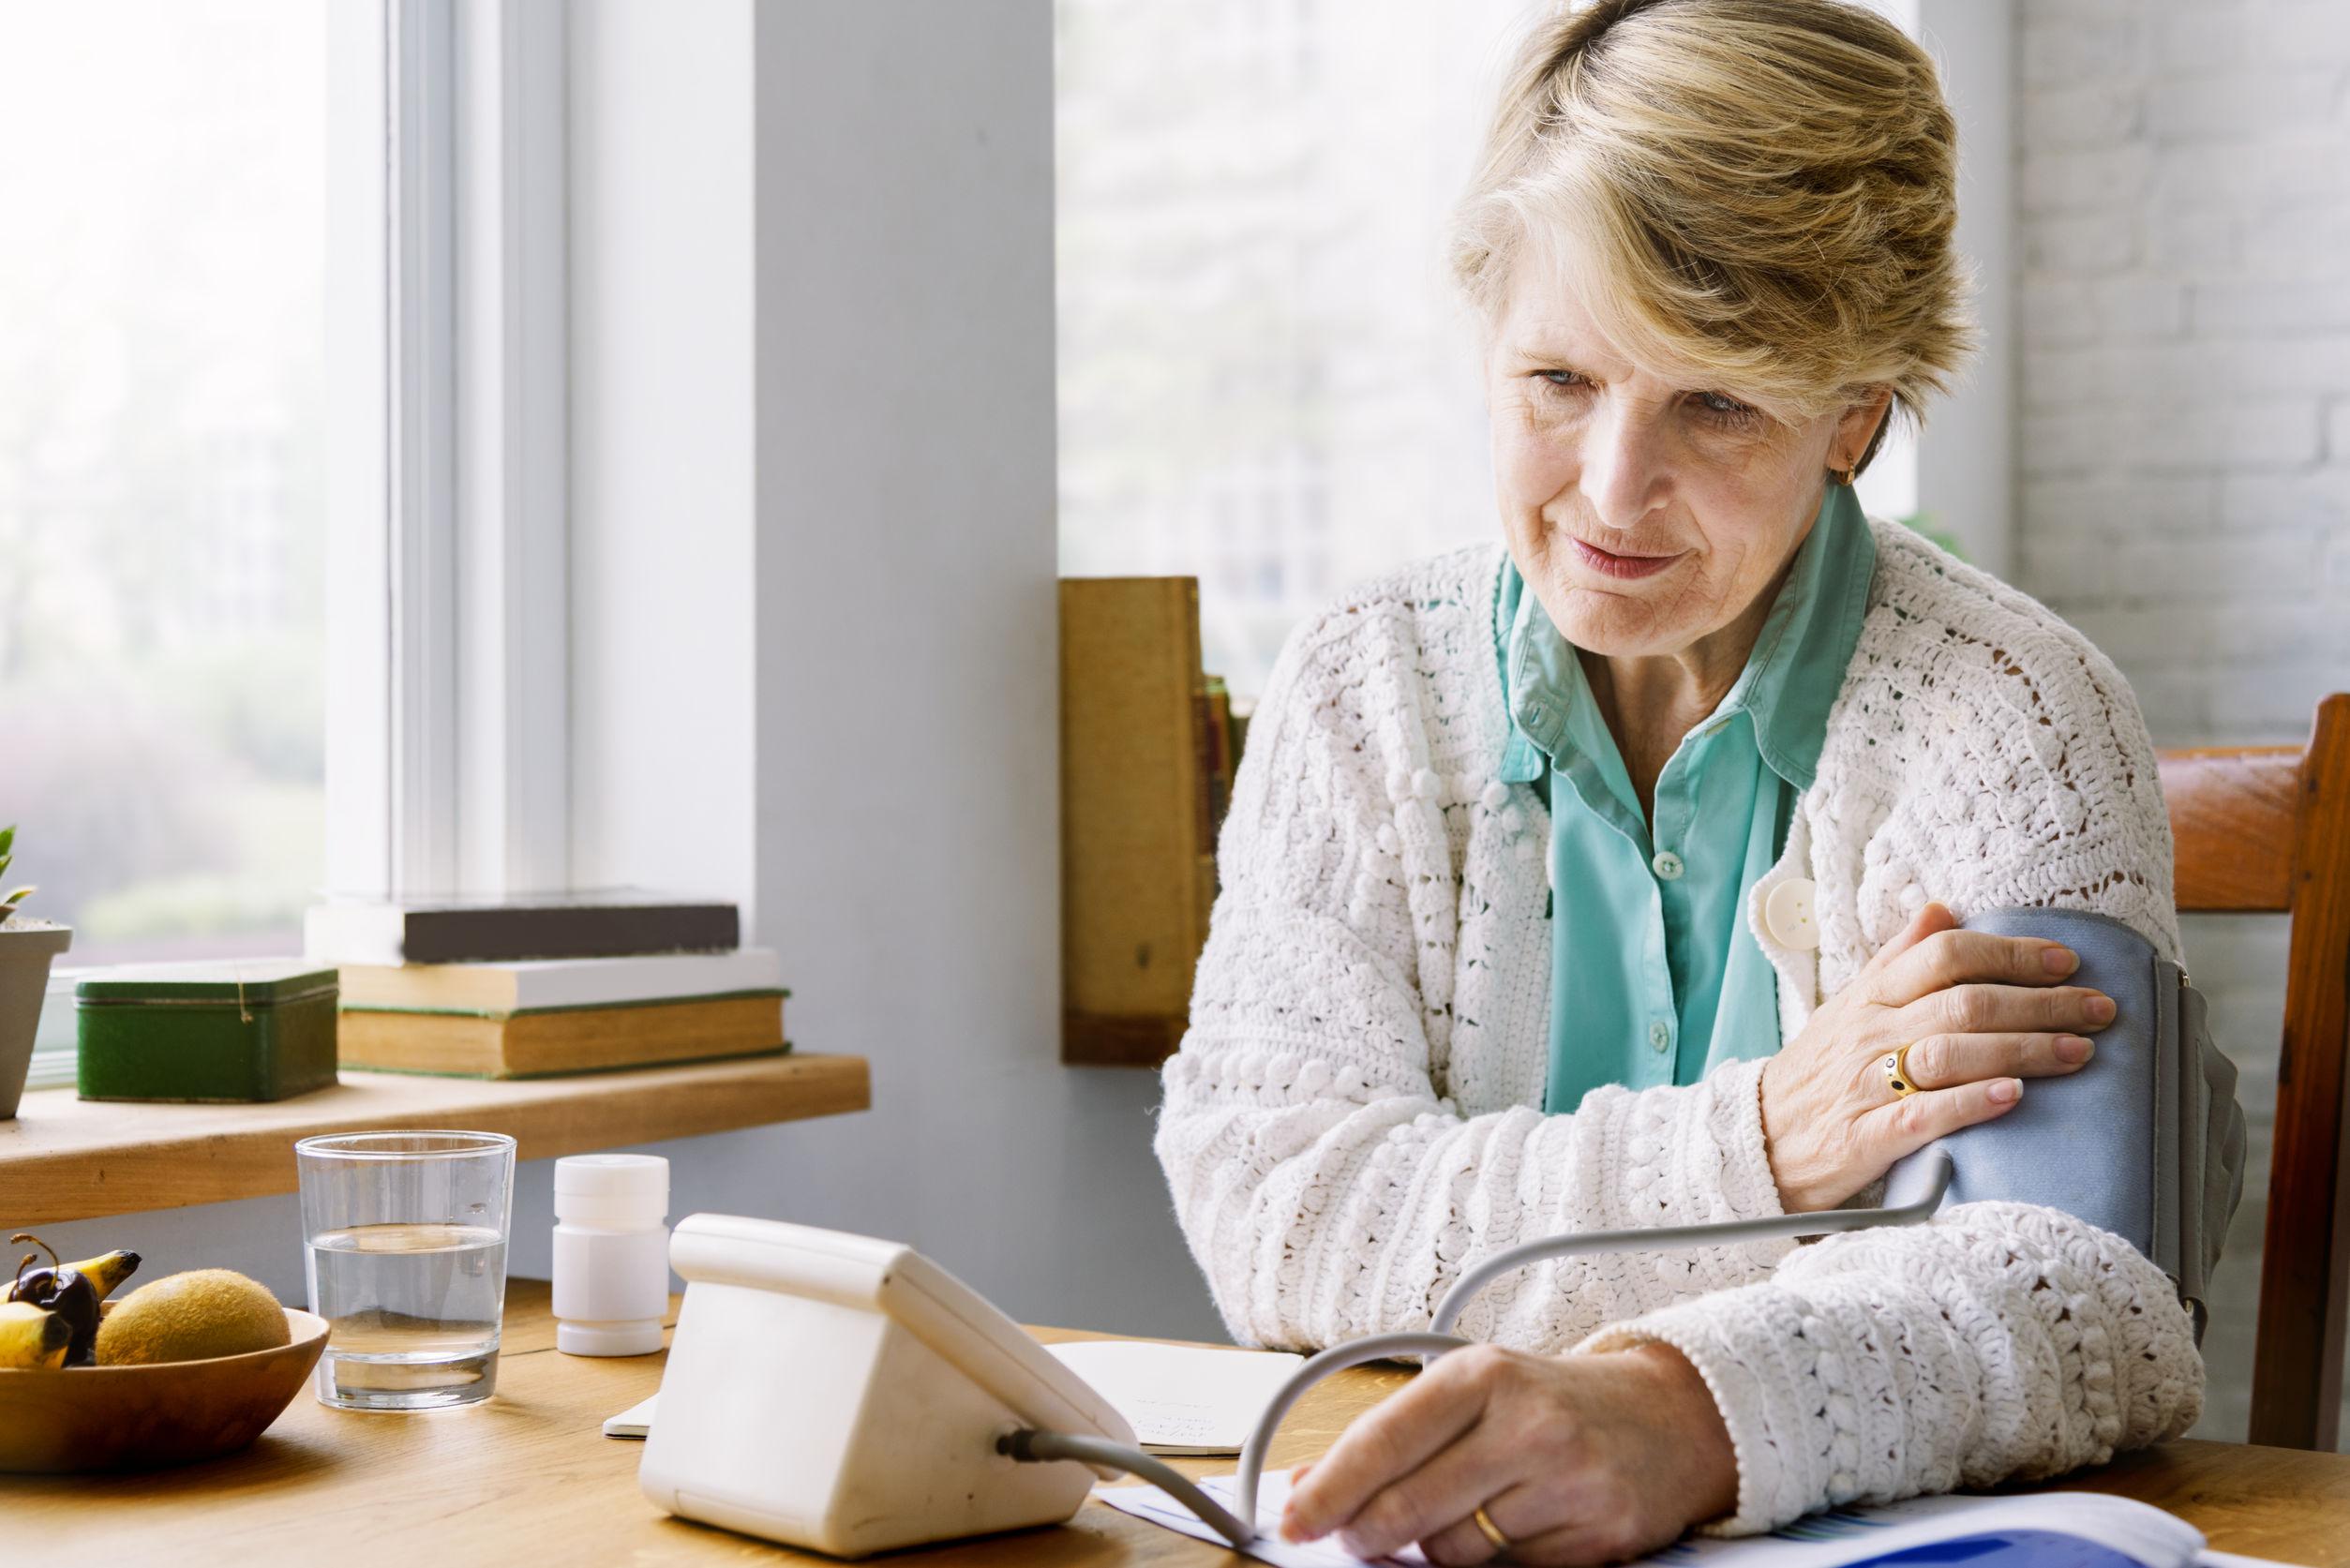 mi a reggeli magas vérnyomás súlyos magas vérnyomás nőknél